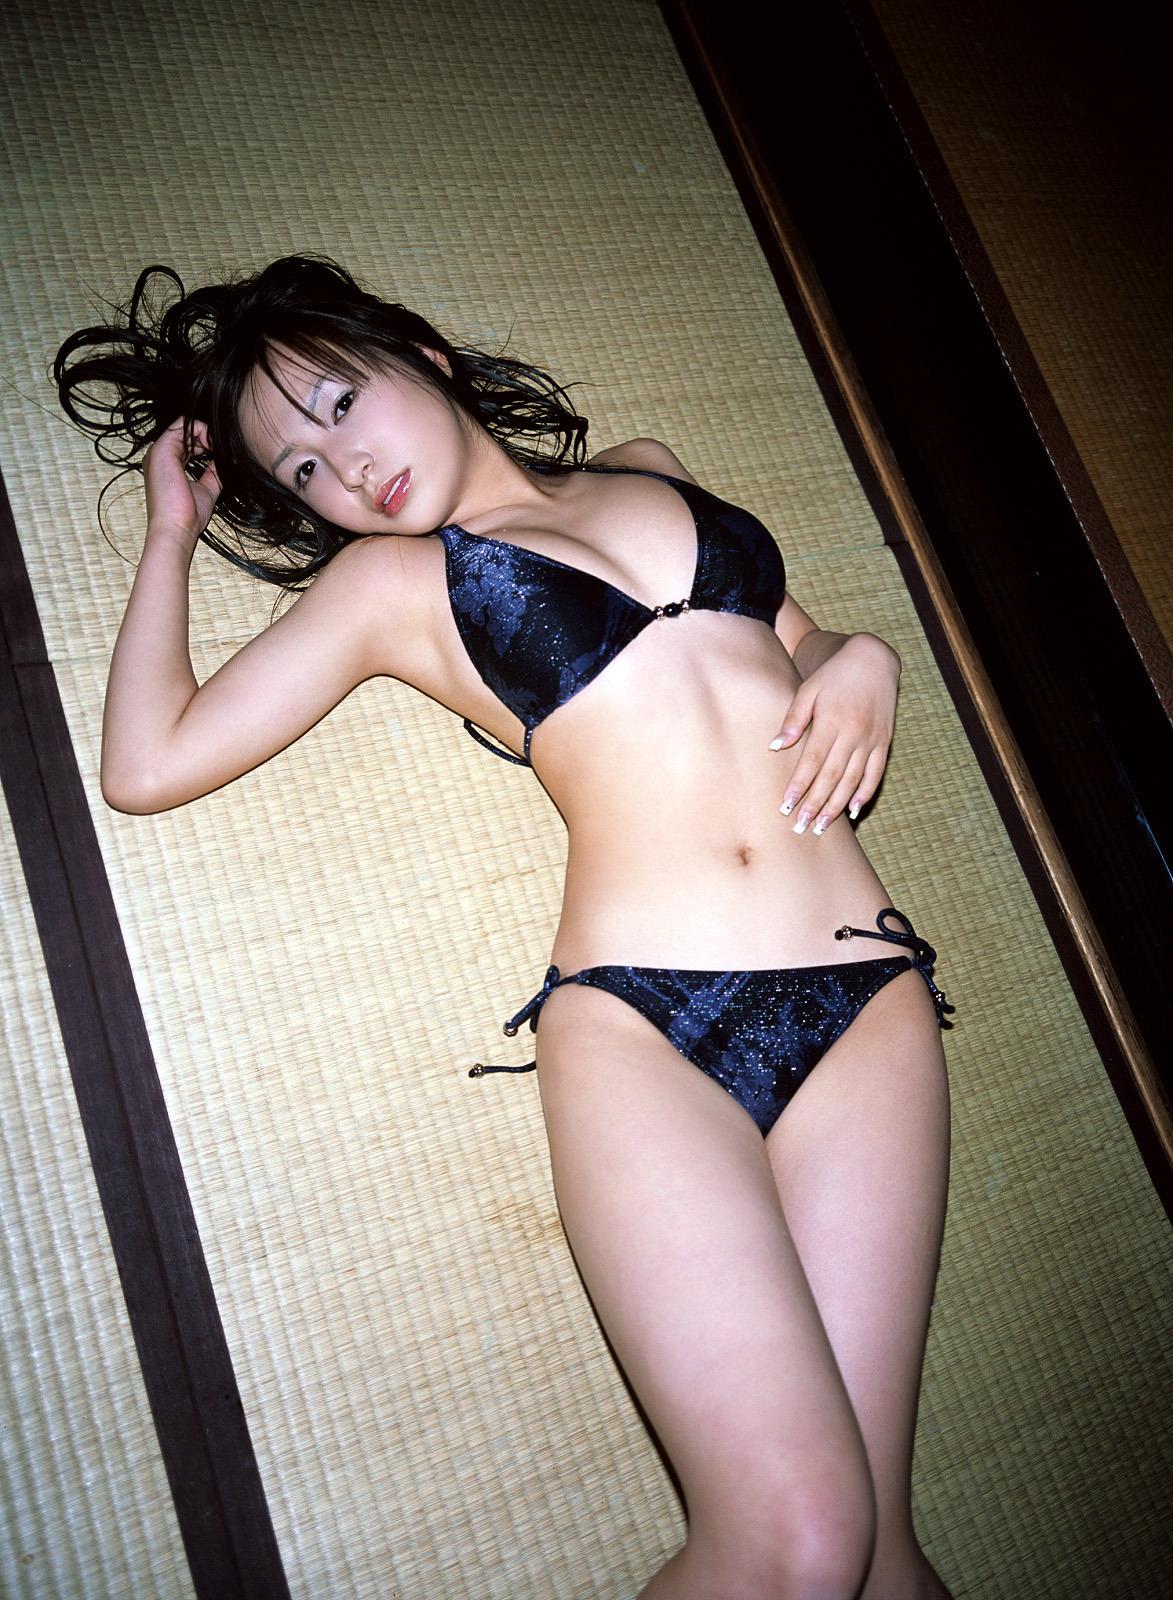 Ishii Meguru Photo Gallery